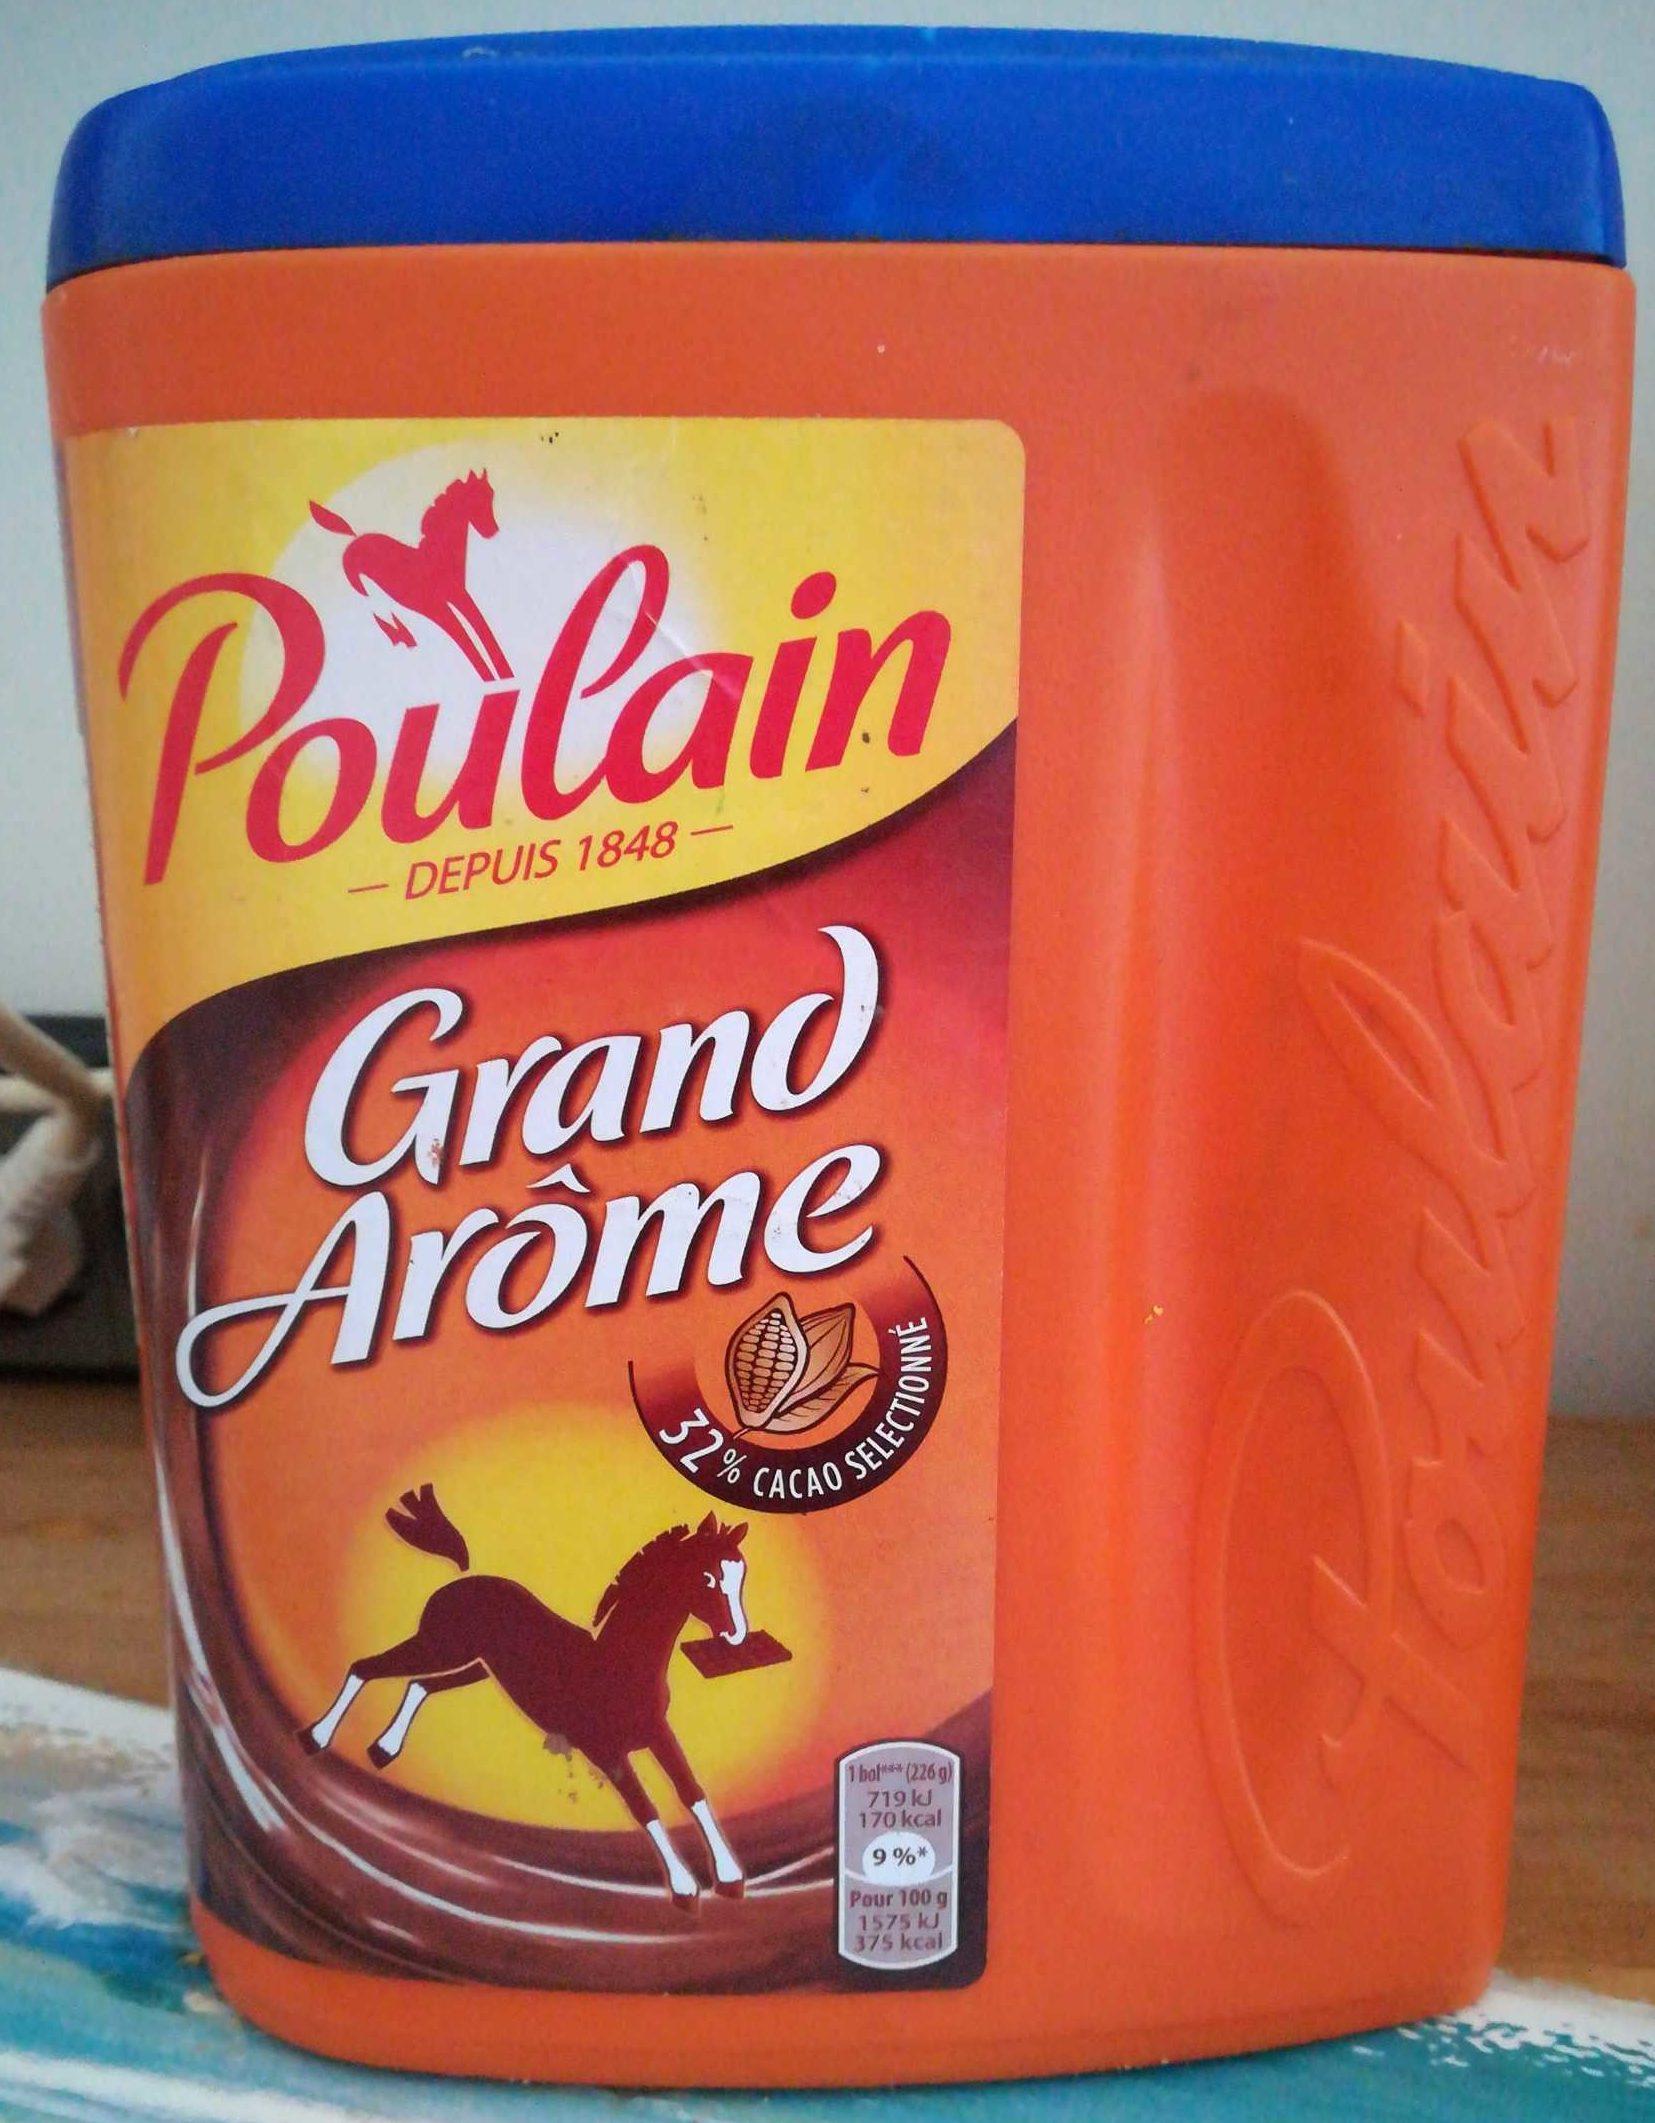 Grand Arôme - Product - fr